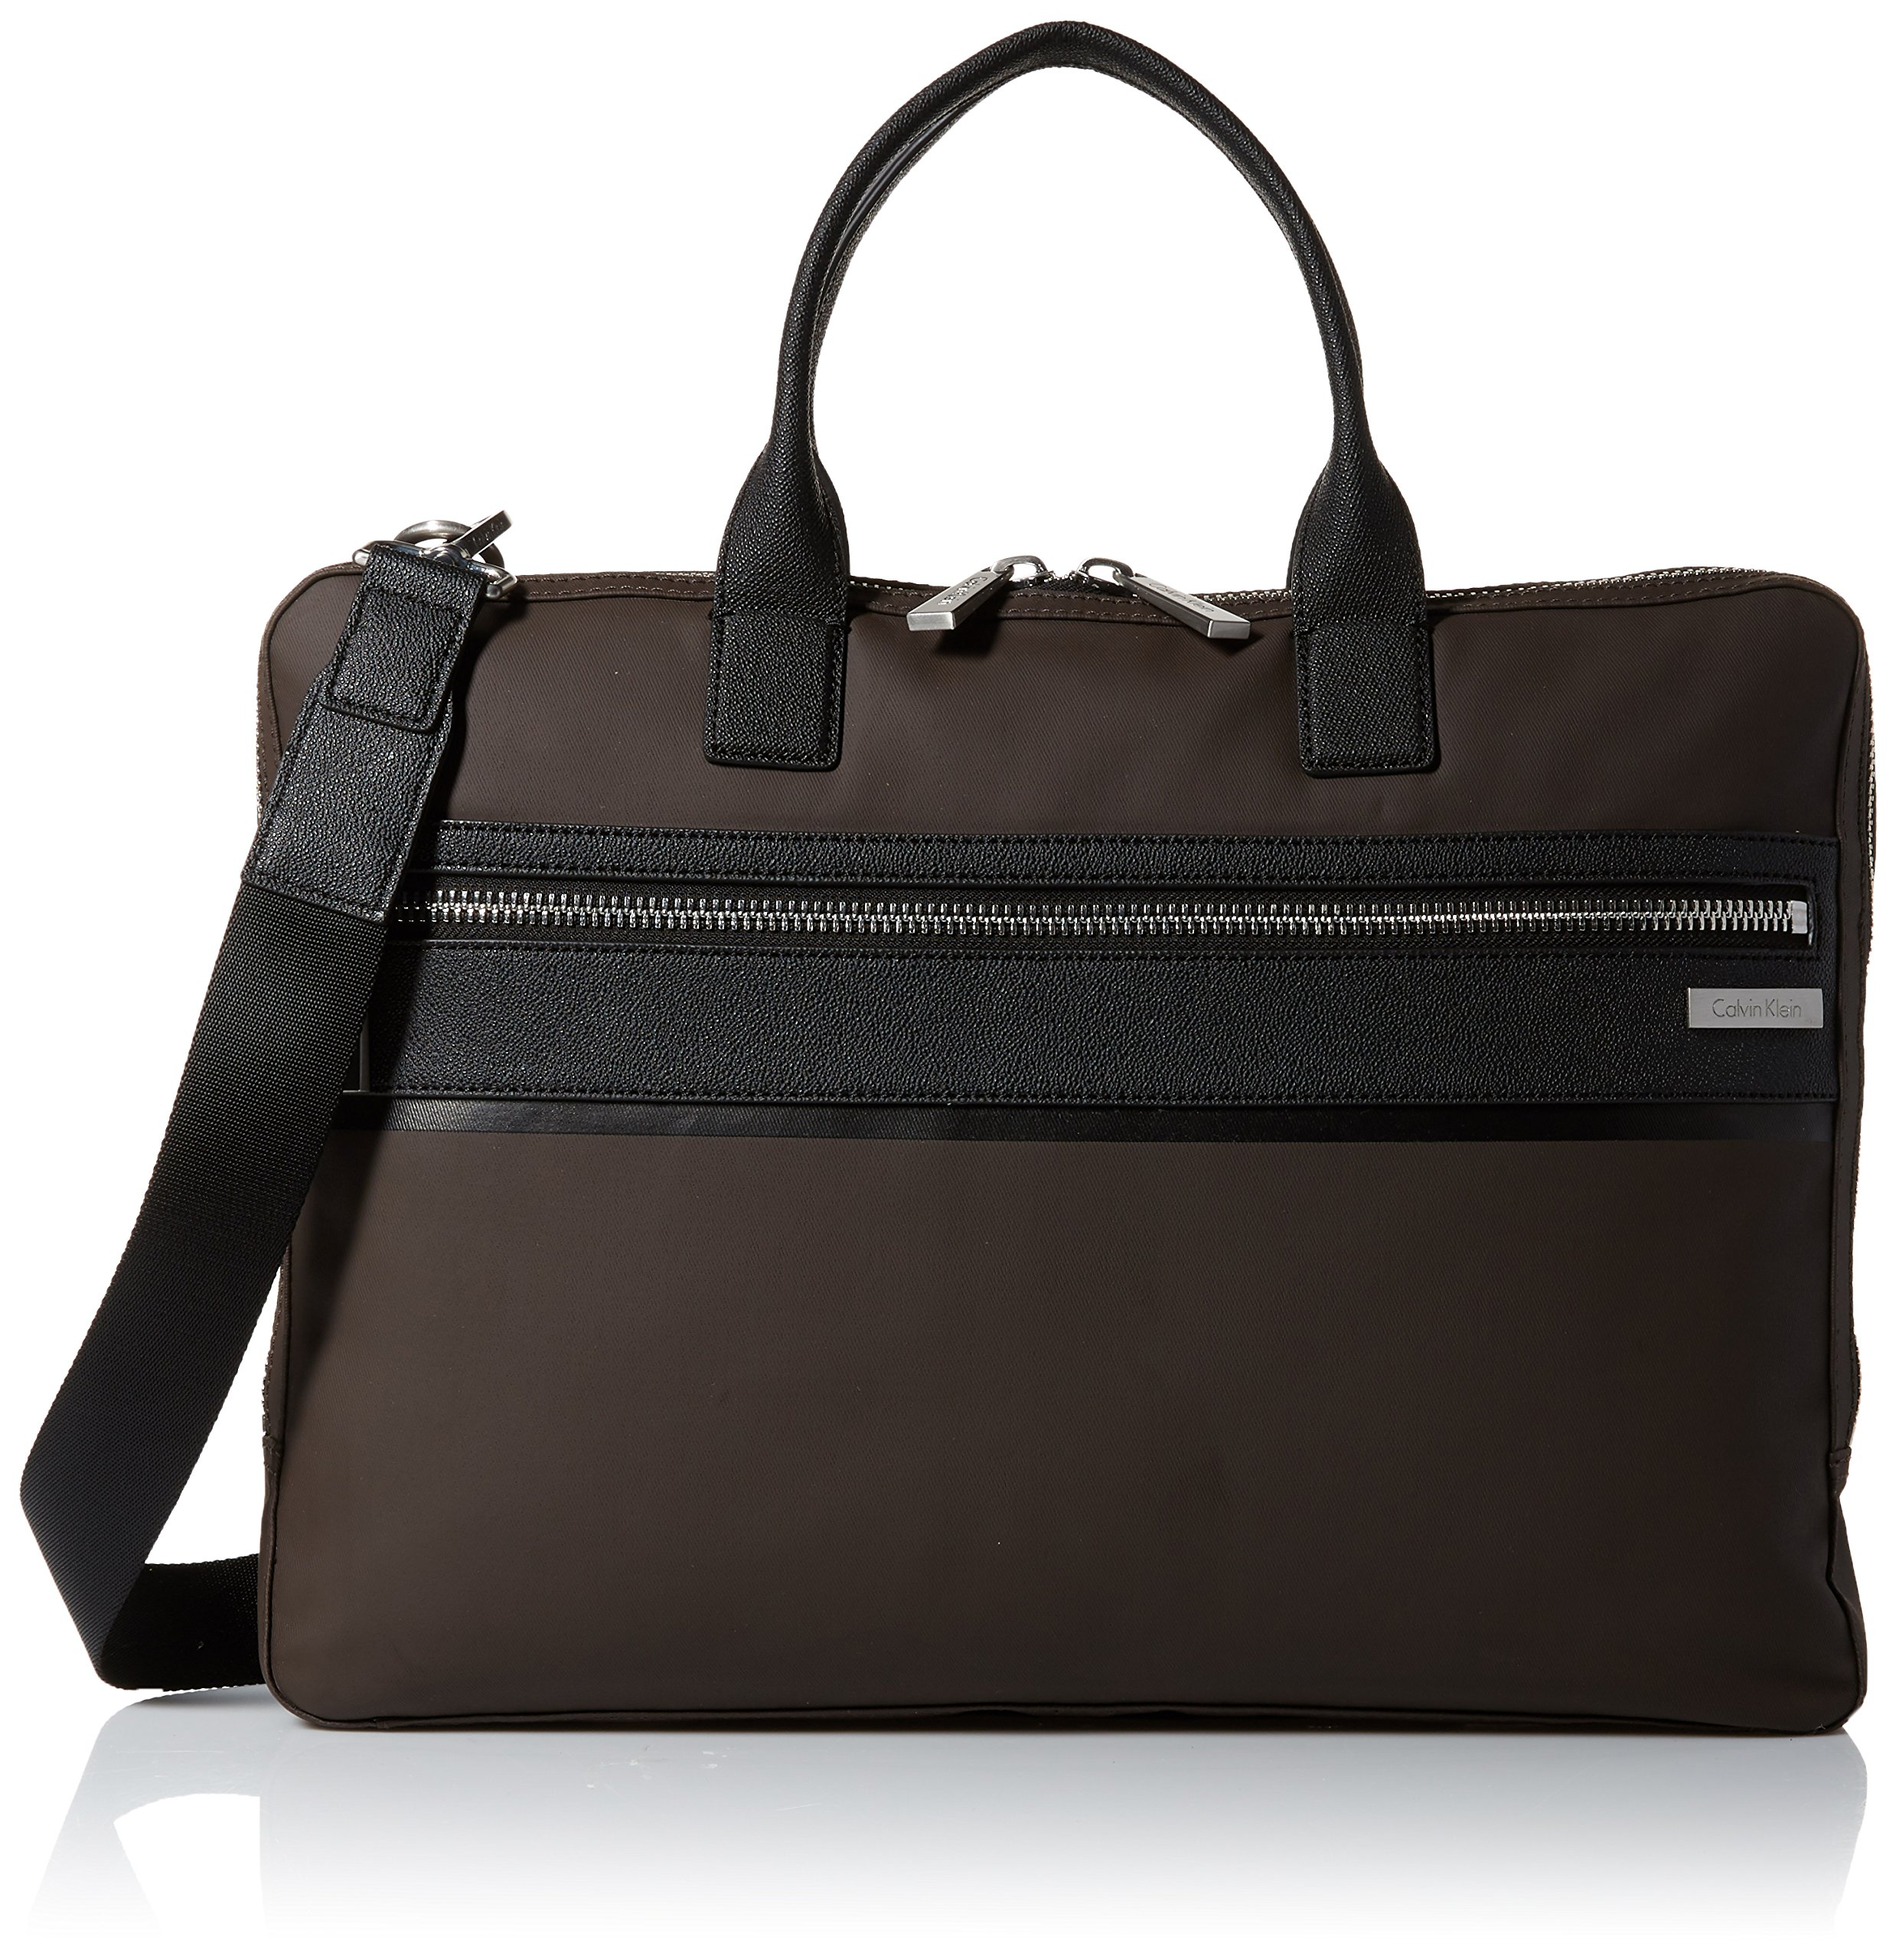 Calvin Klein Men's Nylon with Saffiano Trim Slim Attache, Dark Chocolate Brown